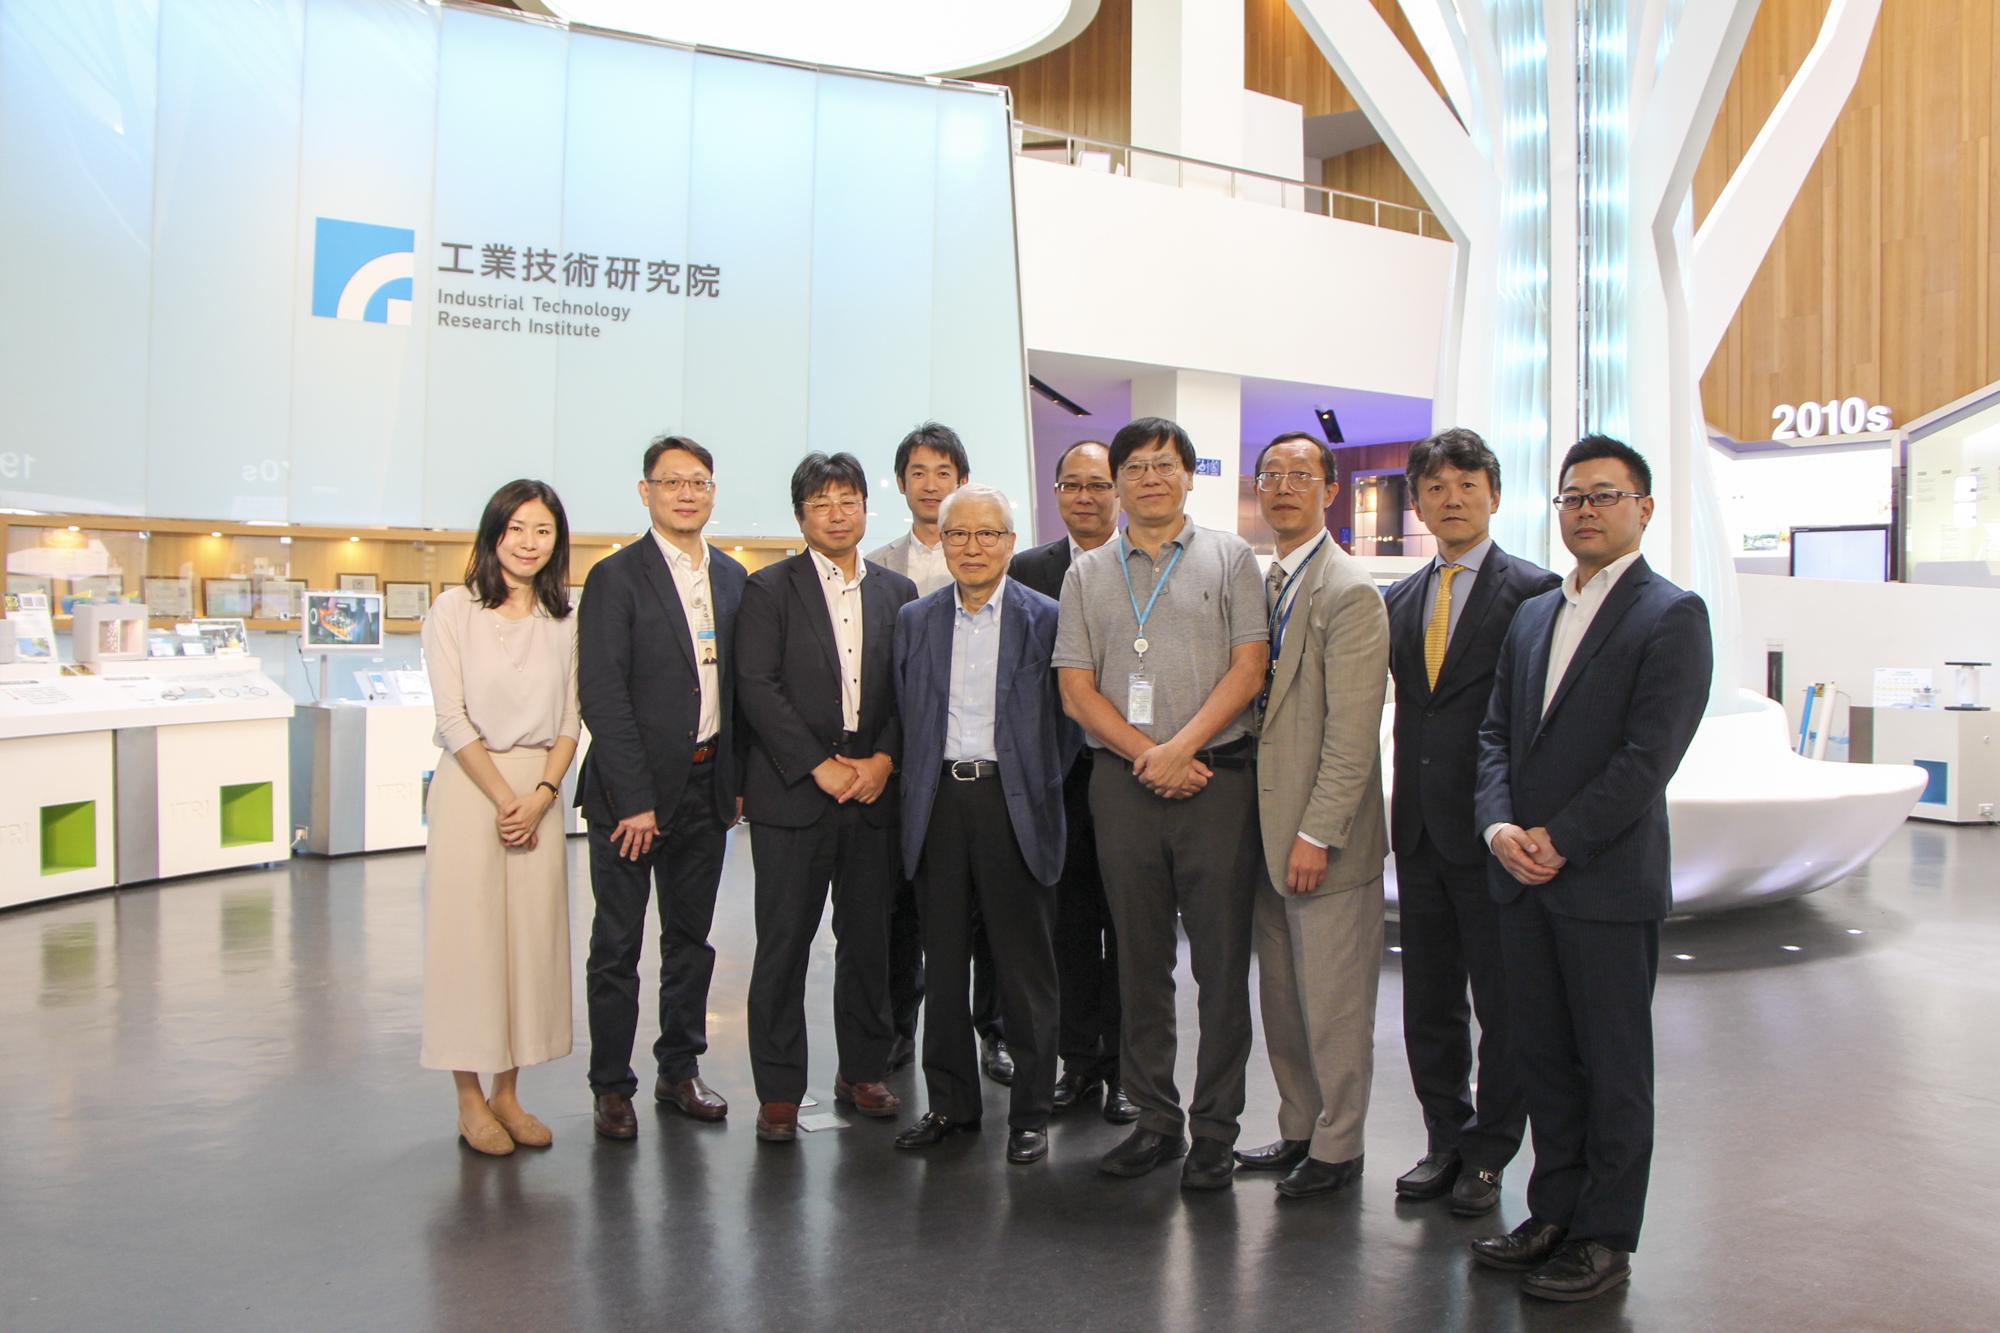 ITRIショールームで熊谷先生、ITRI 研究員、富士通株式会社第二ヘルスケアソリューション事業部の面々